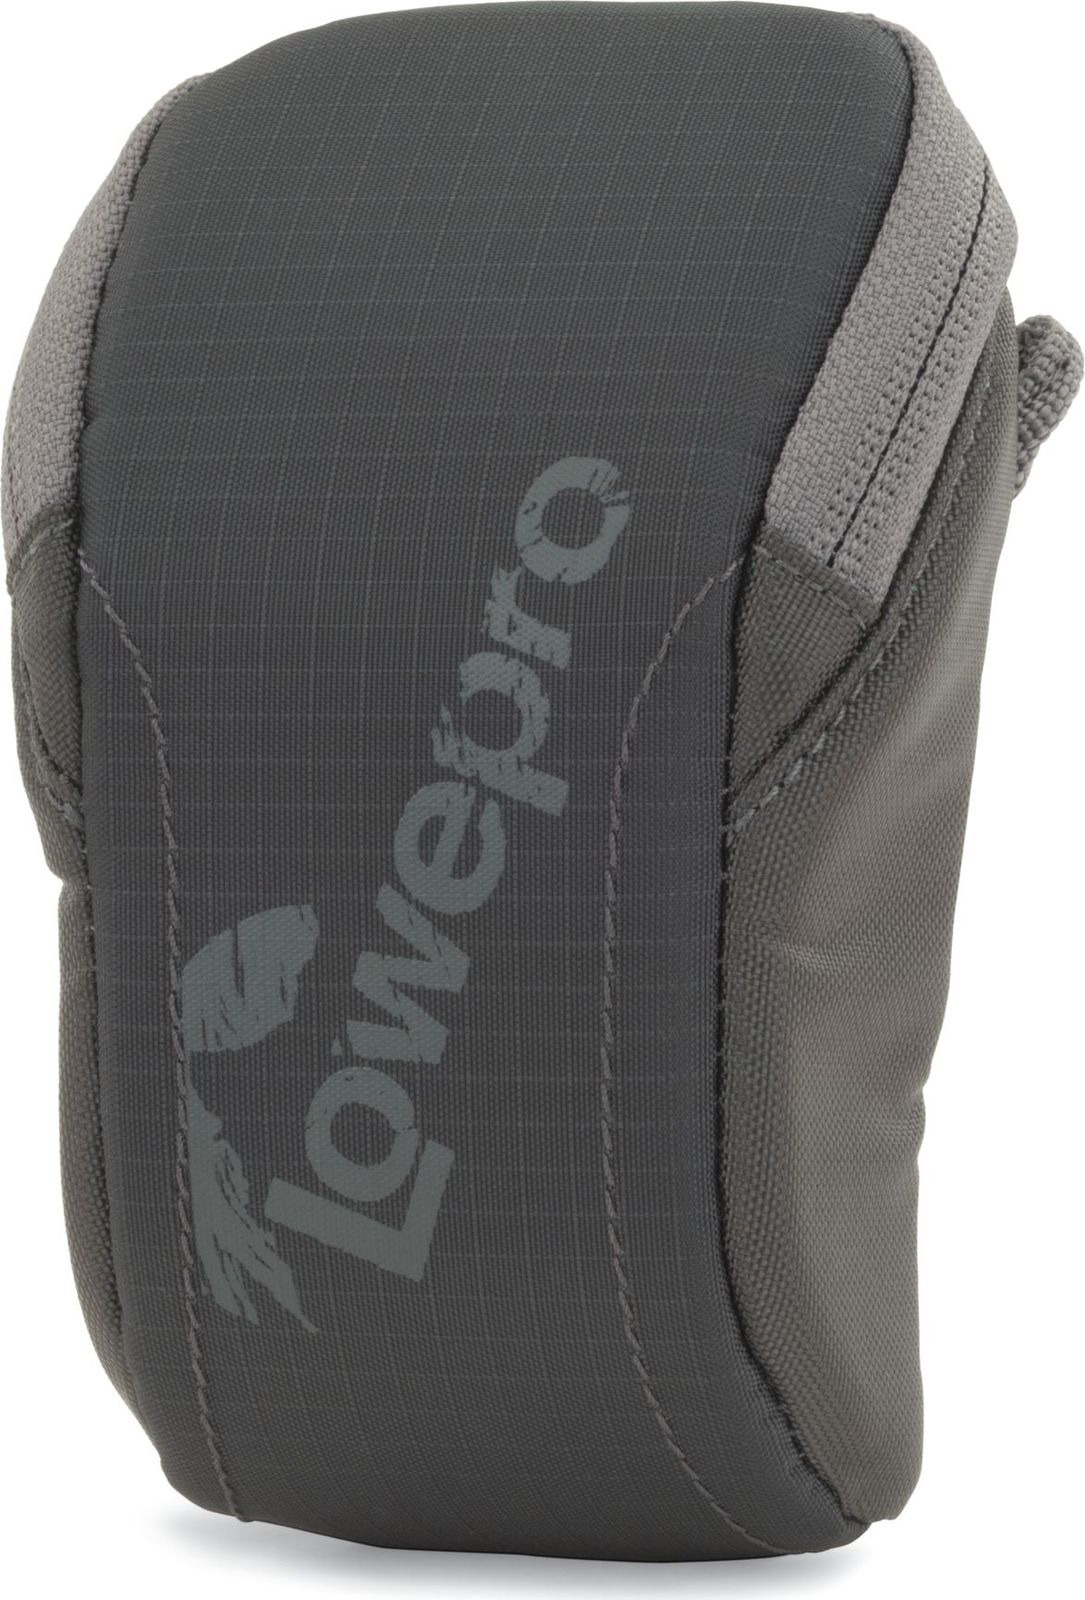 Фотосумка Lowepro Dashpoint 10, LP36438-0WW, серый